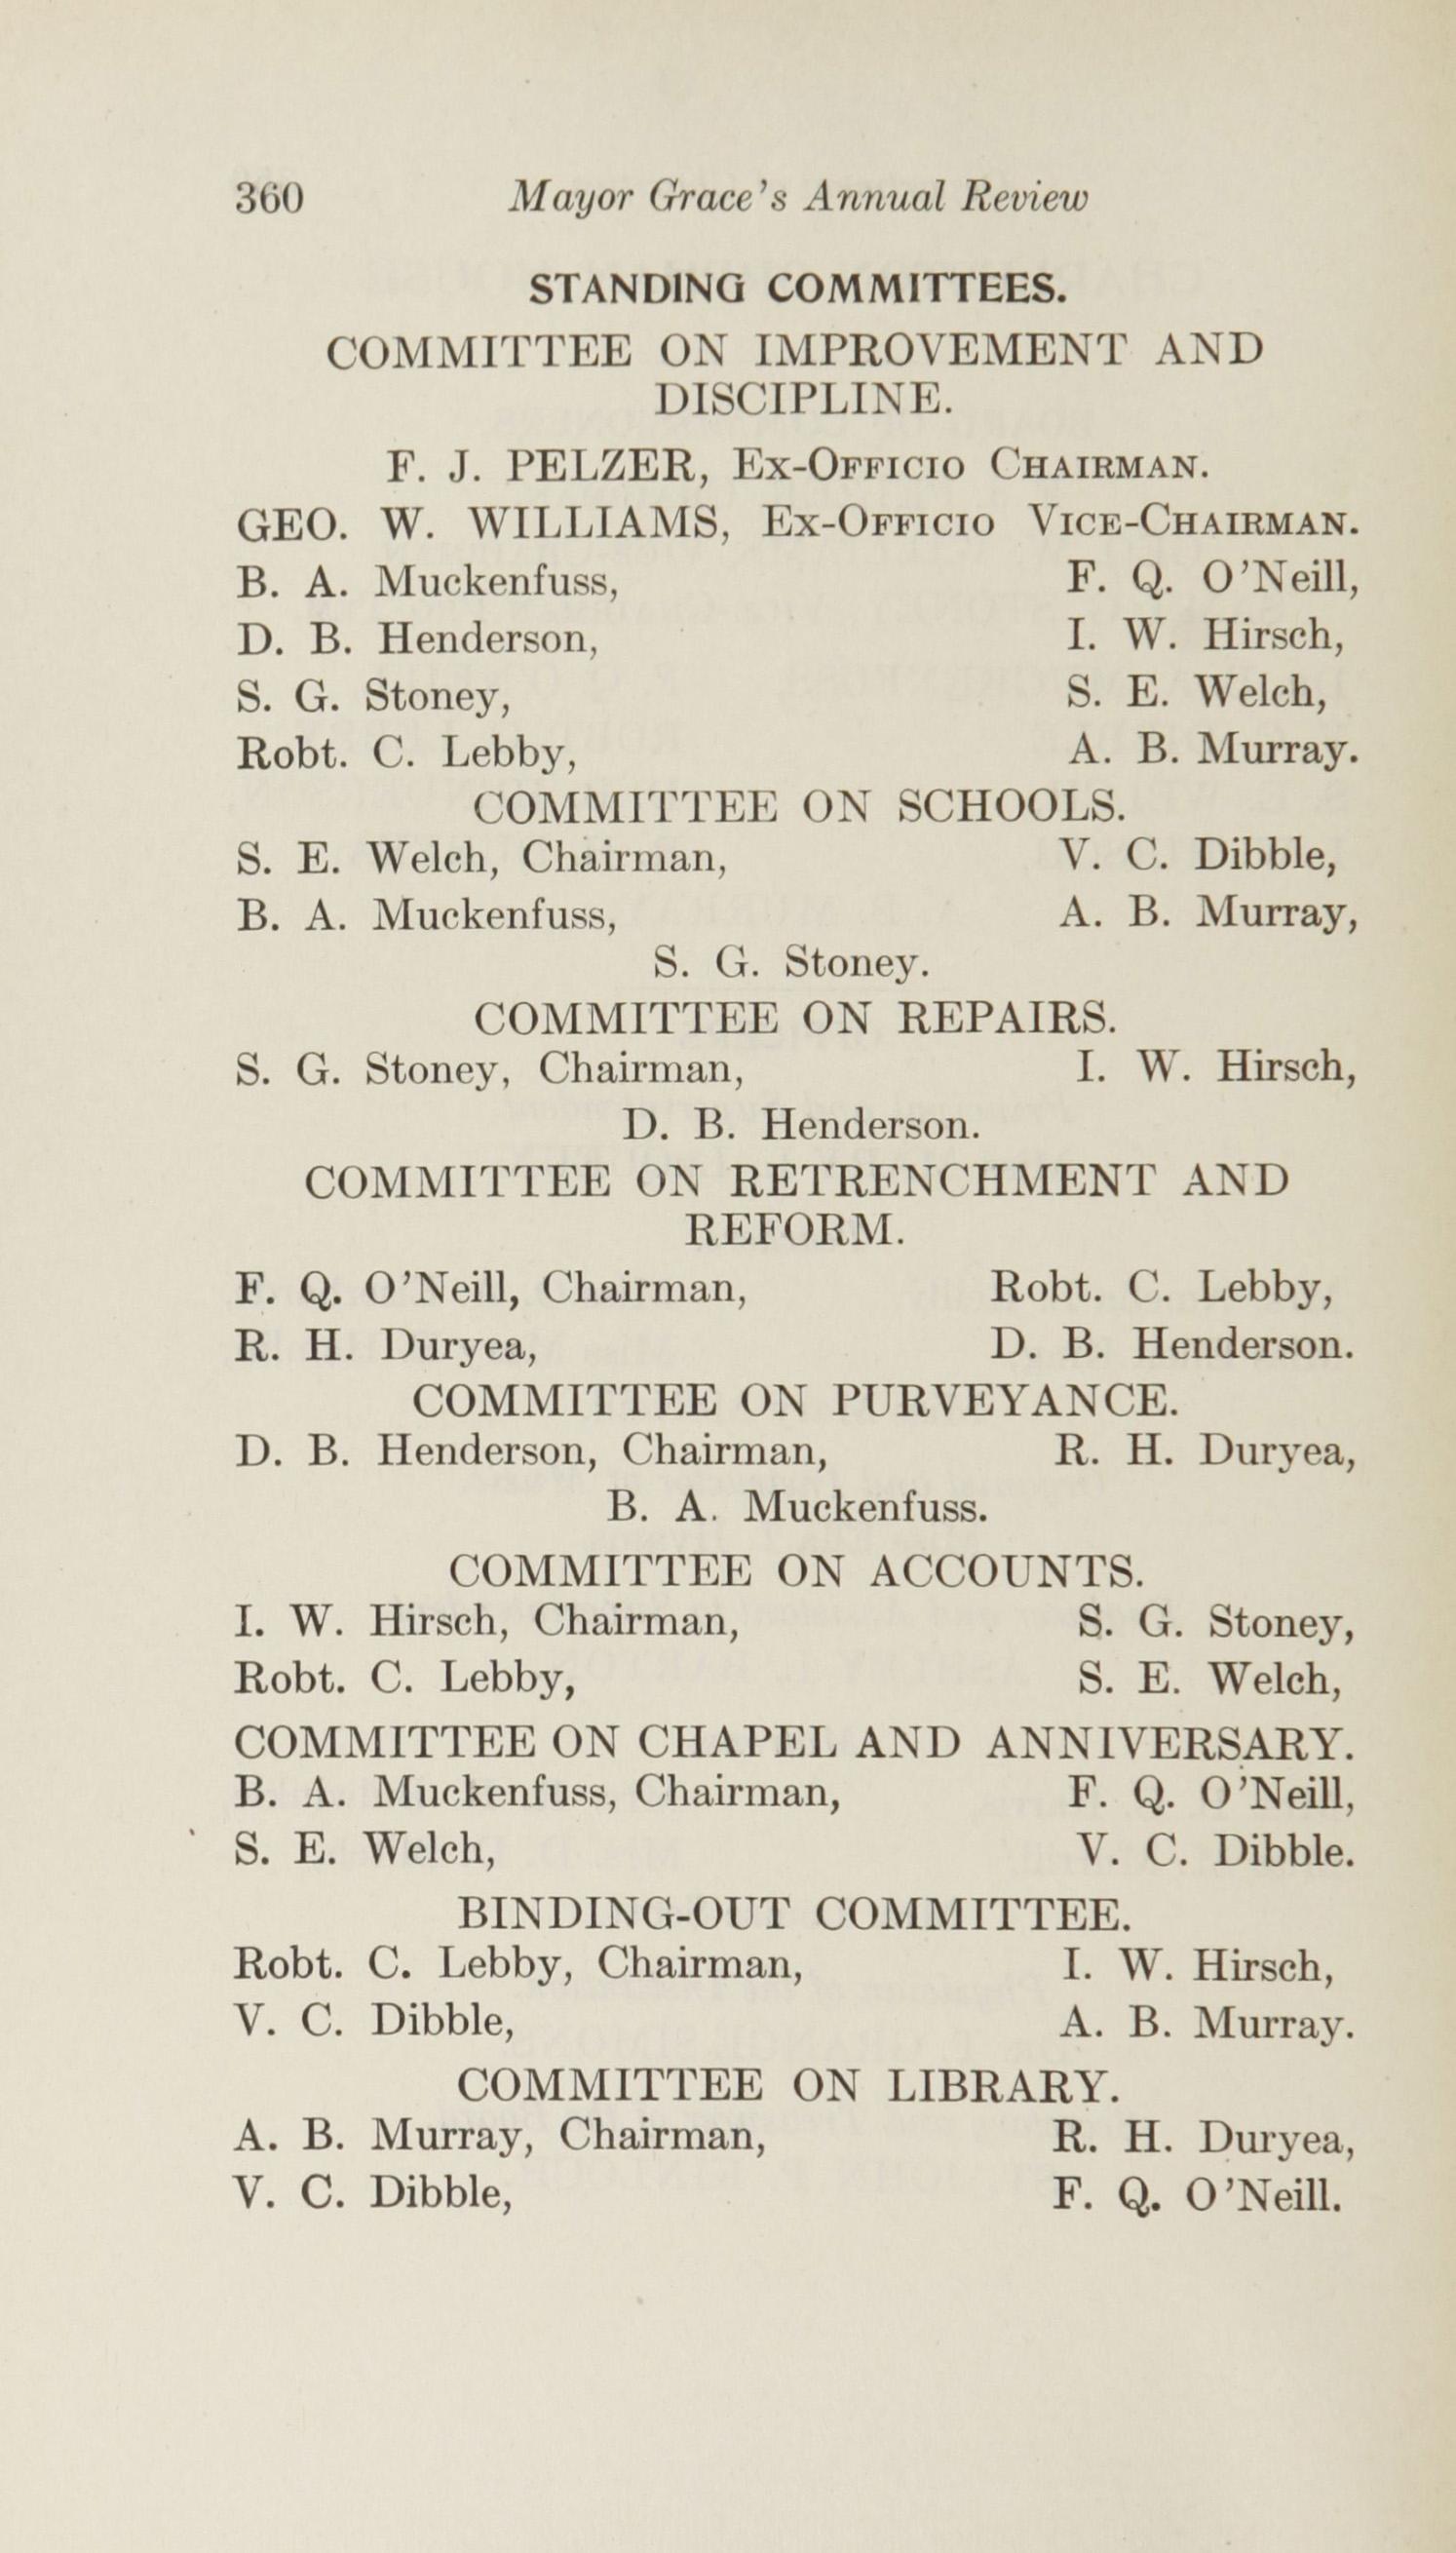 Charleston Yearbook, 1915, page 360